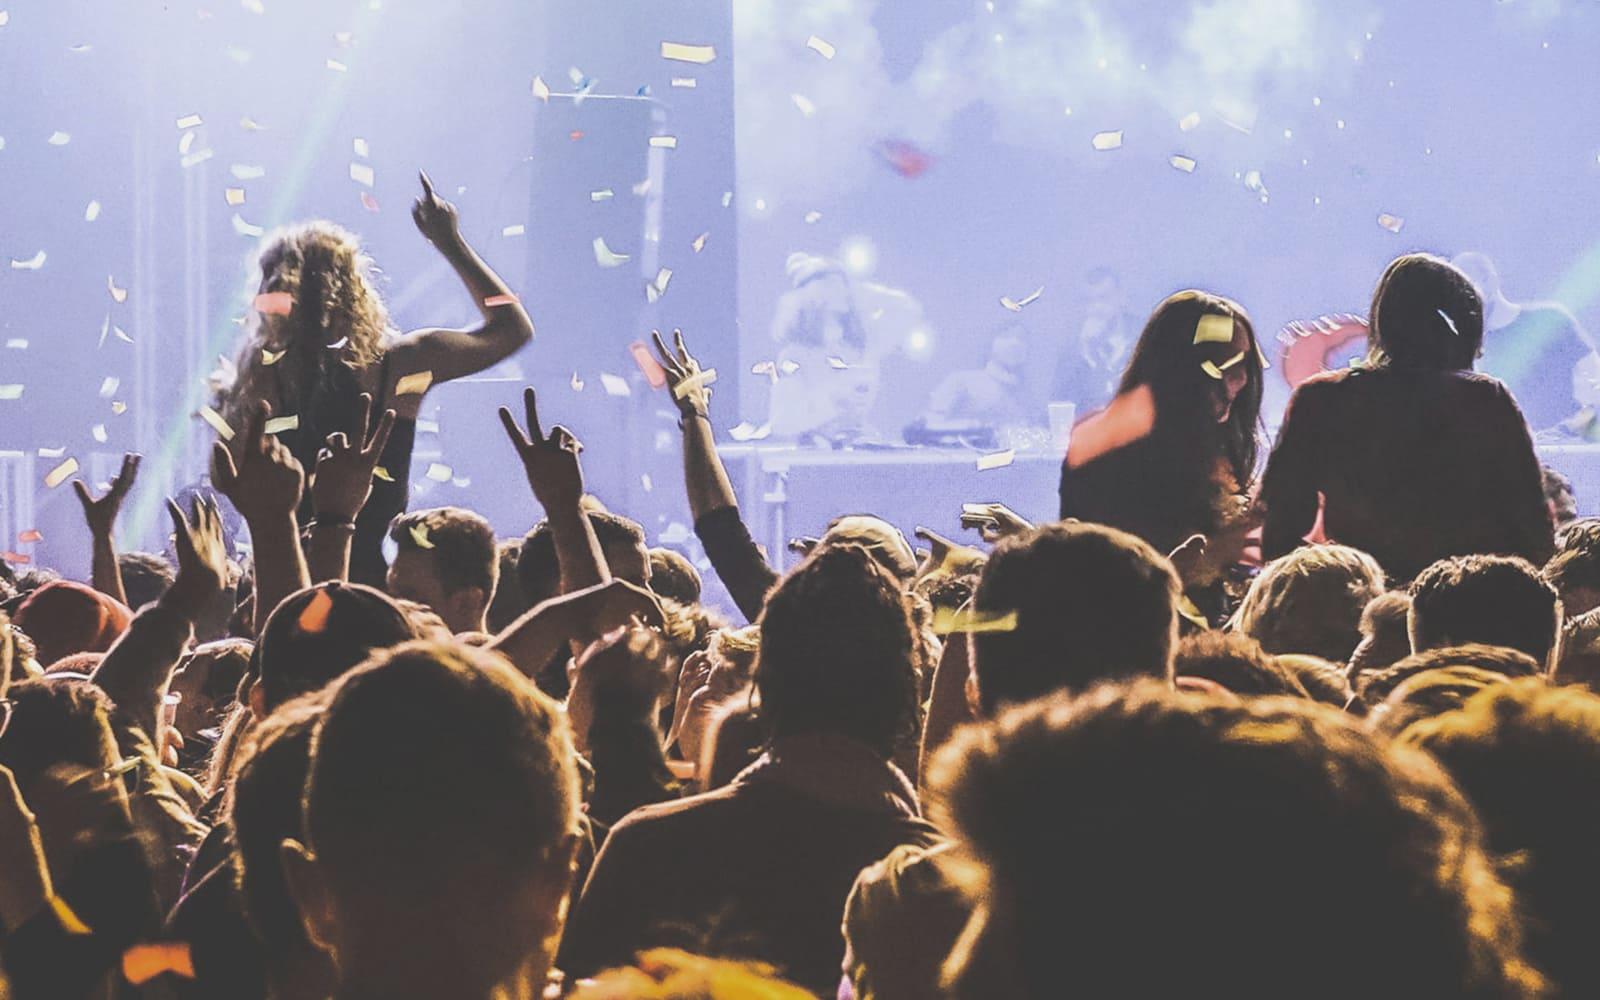 Jlenia Costner - Rauschende Feste feiern